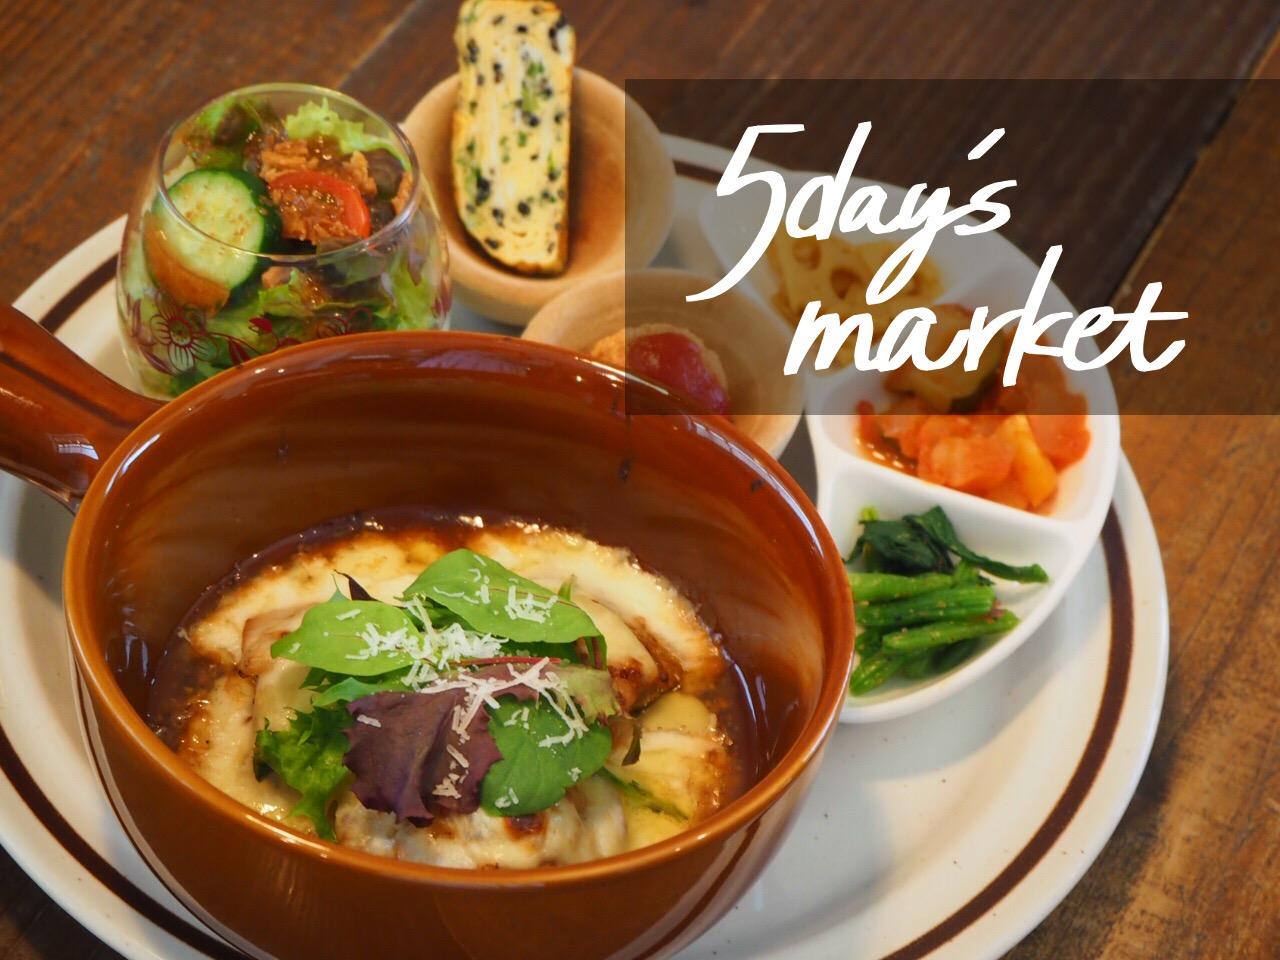 5day's market